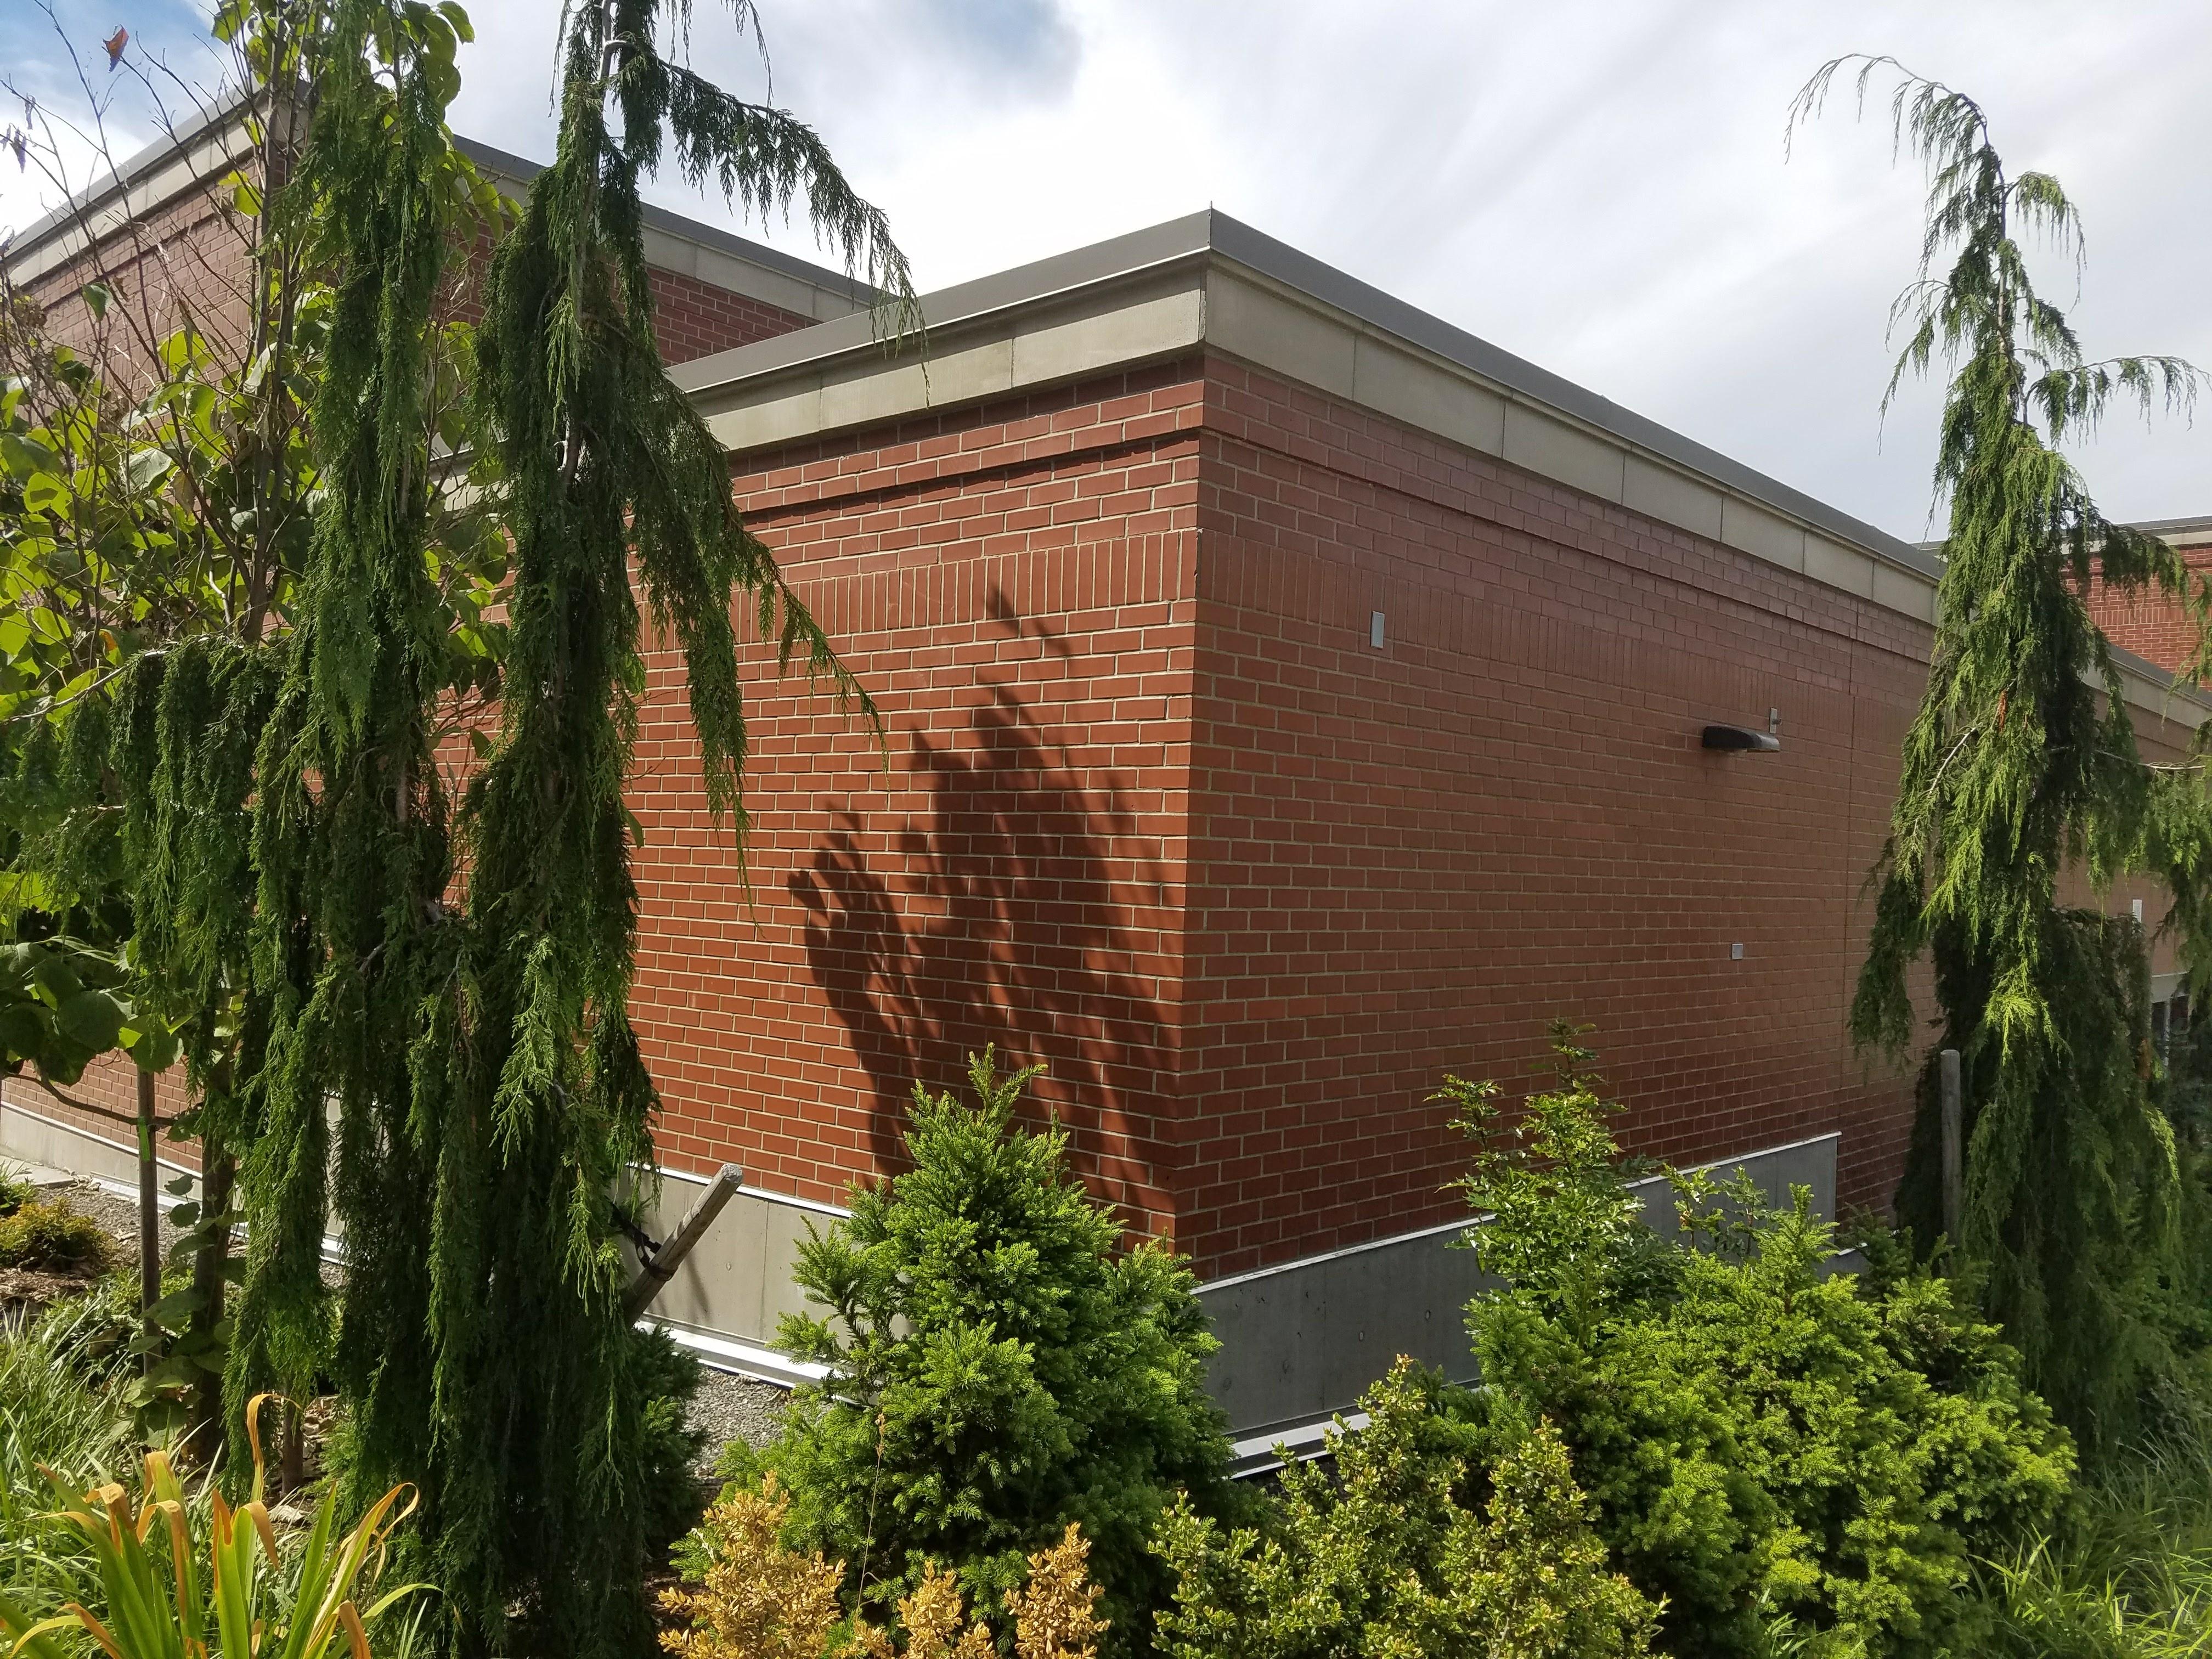 Lowell Elementary 3